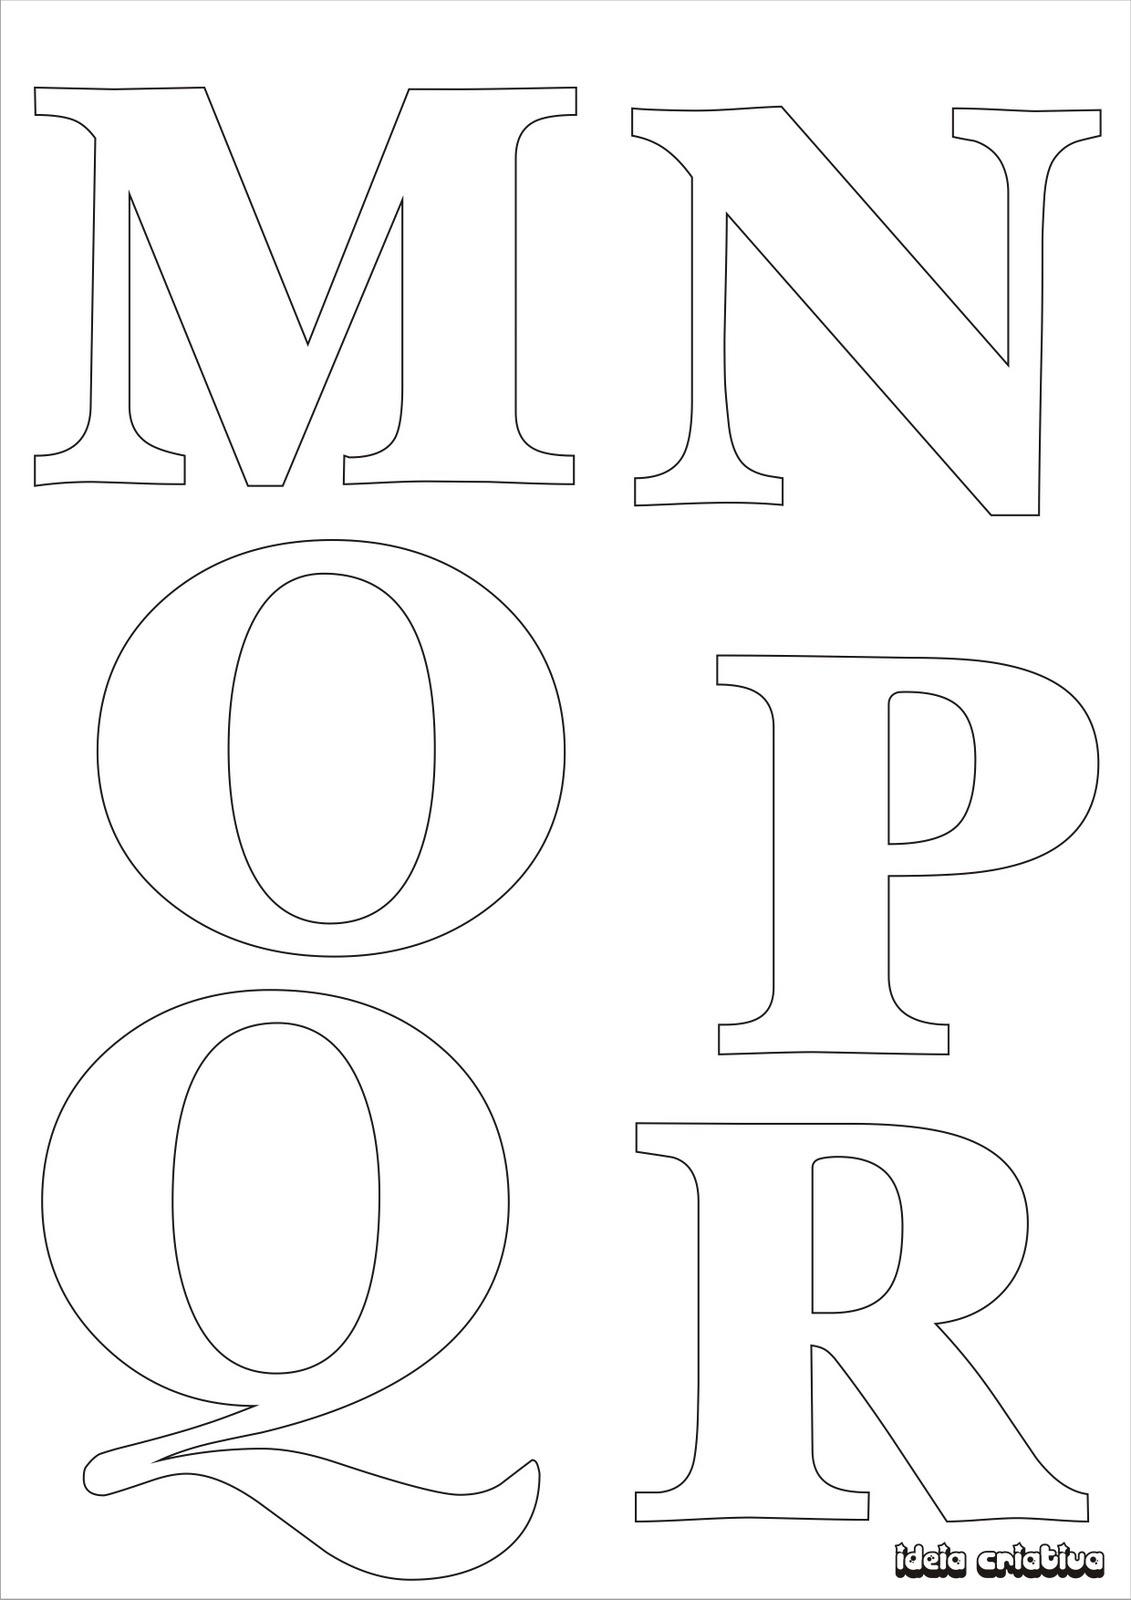 letras%2B3.jpg